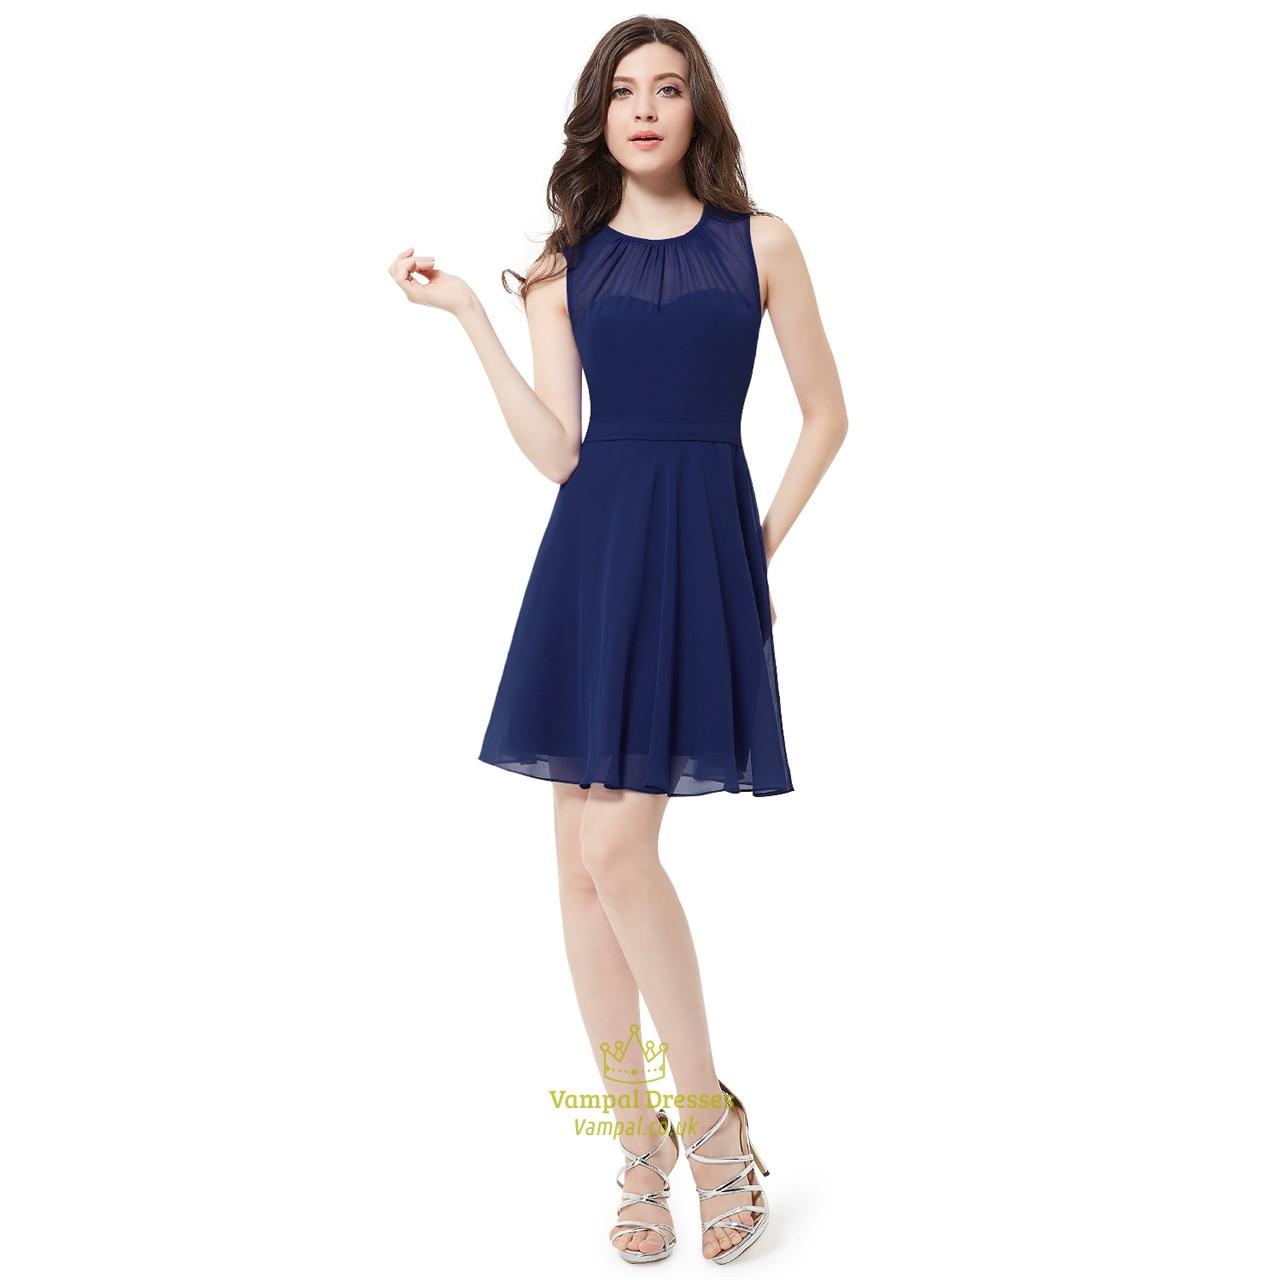 Elegant navy blue sleeveless short chiffon bridesmaid for Short flowing wedding dresses